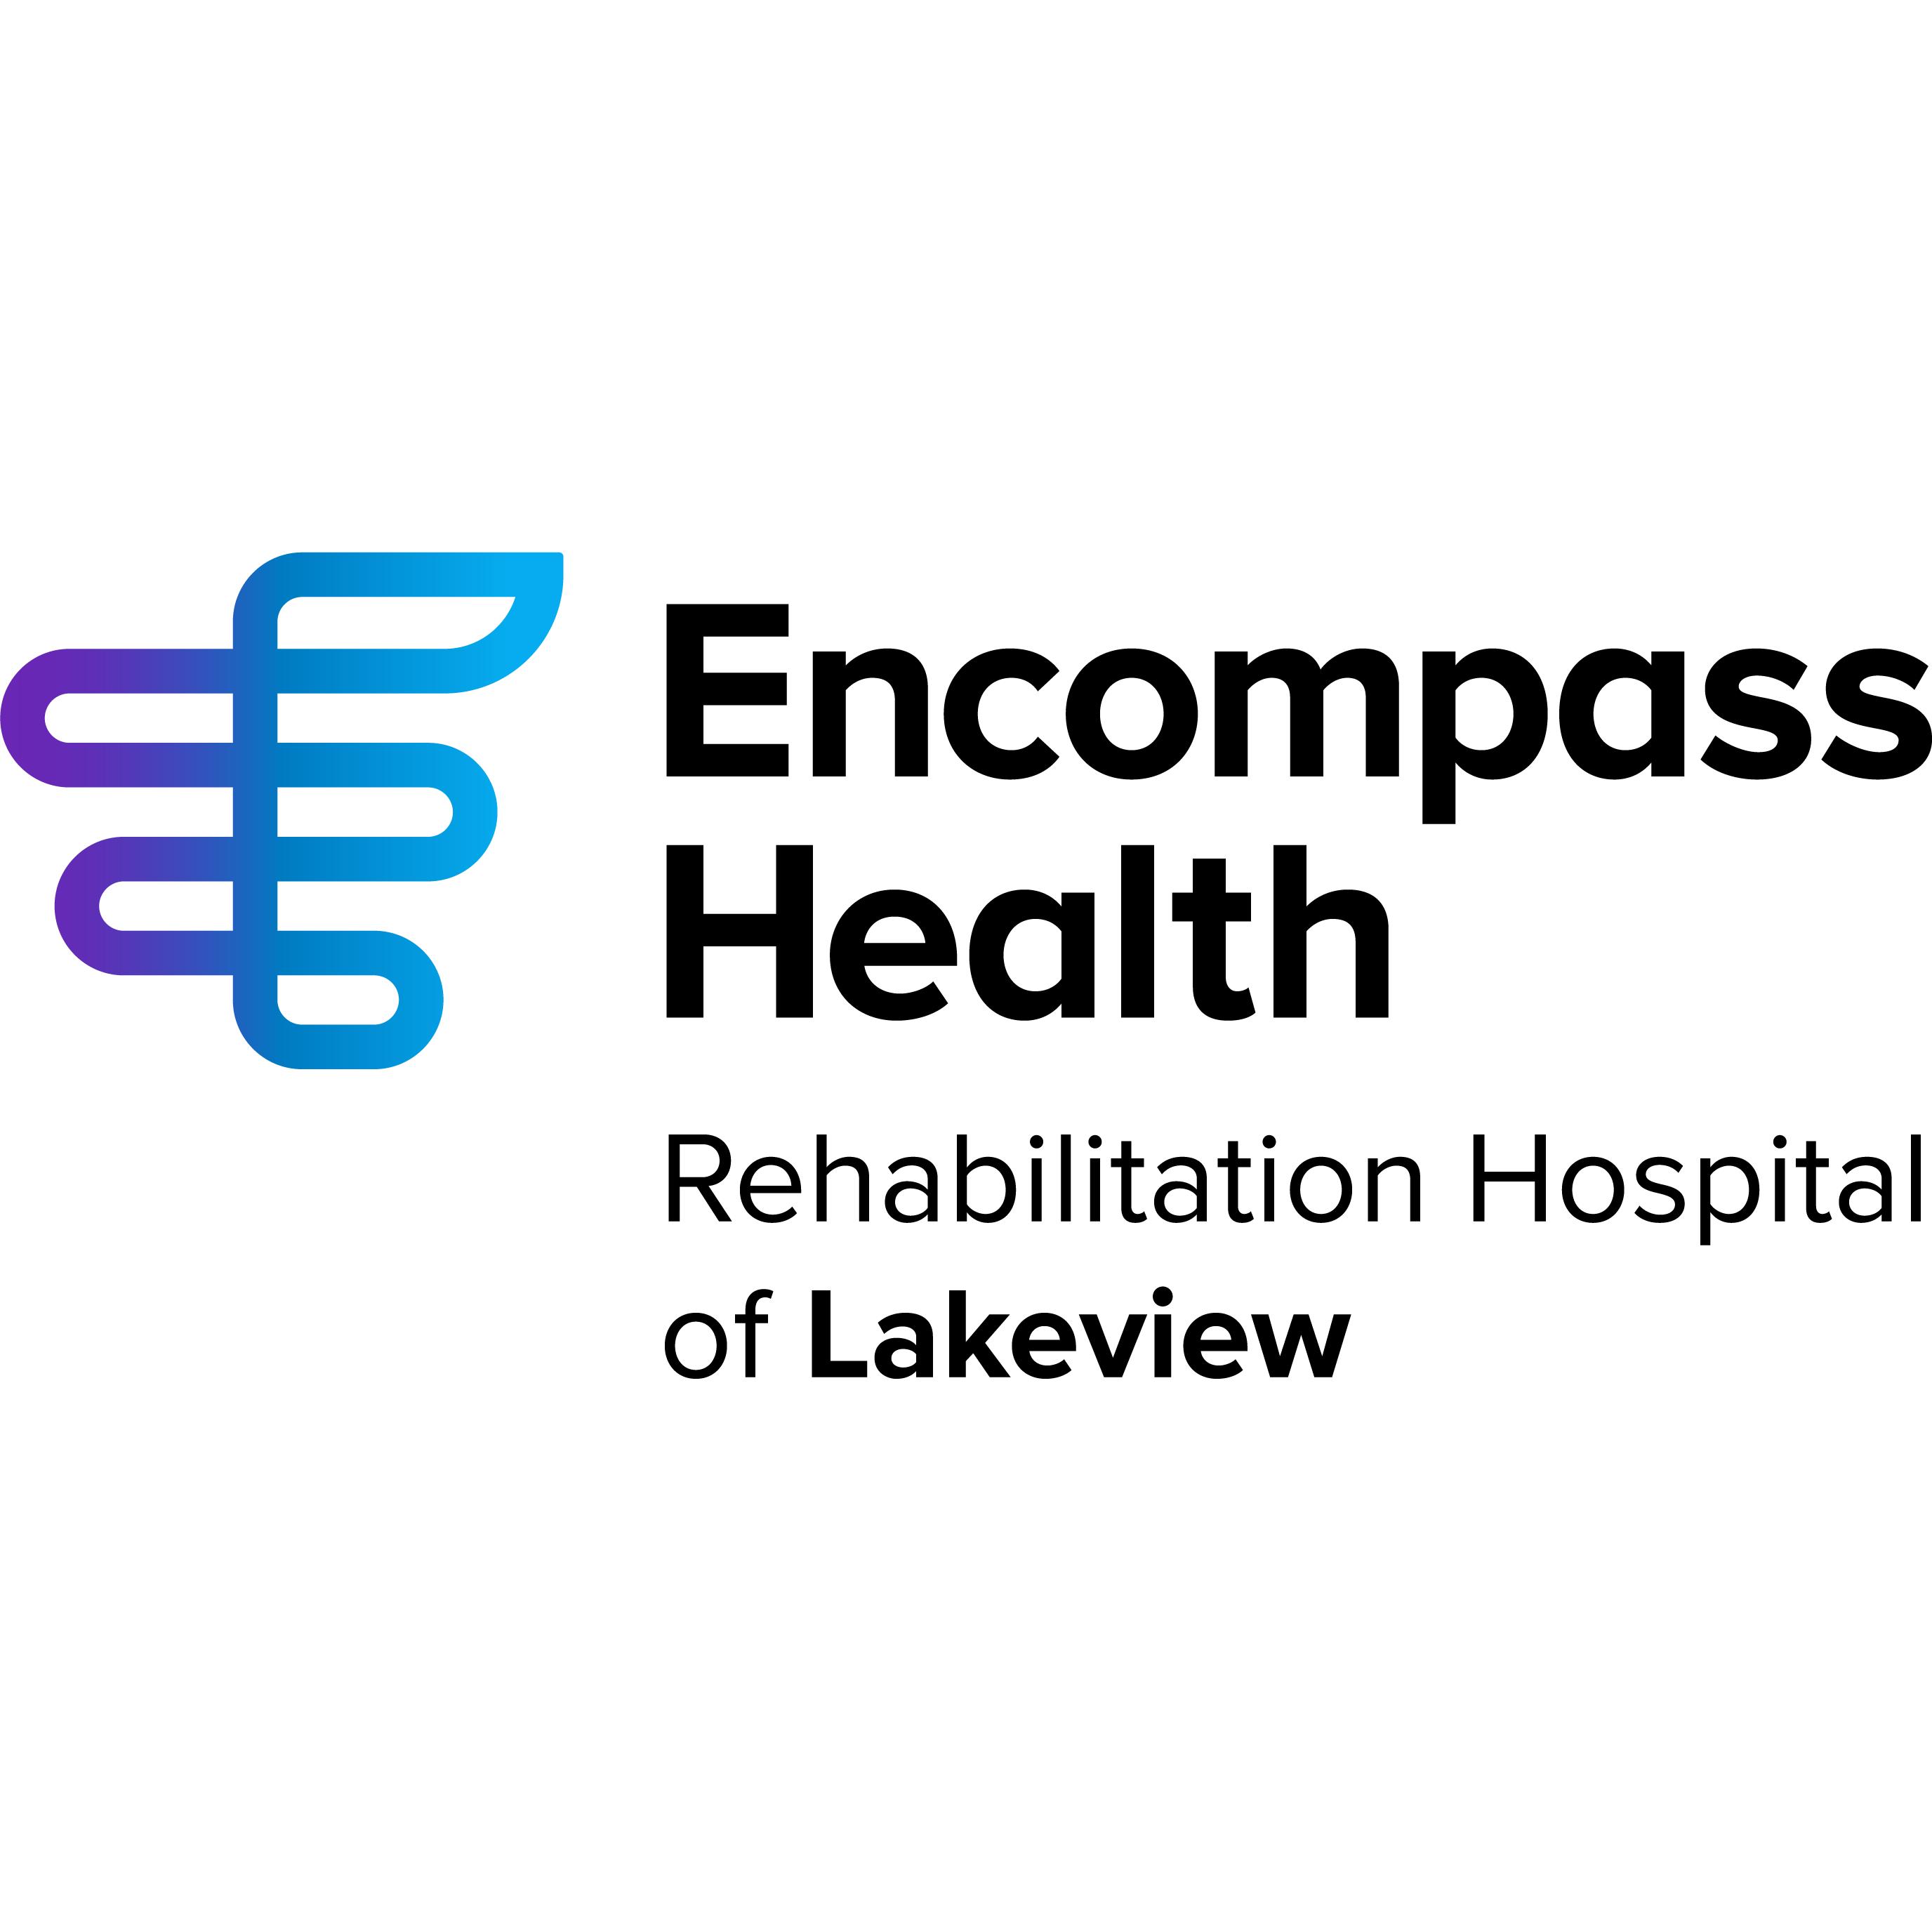 Encompass Health Rehabilitation Hospital of Lakeview